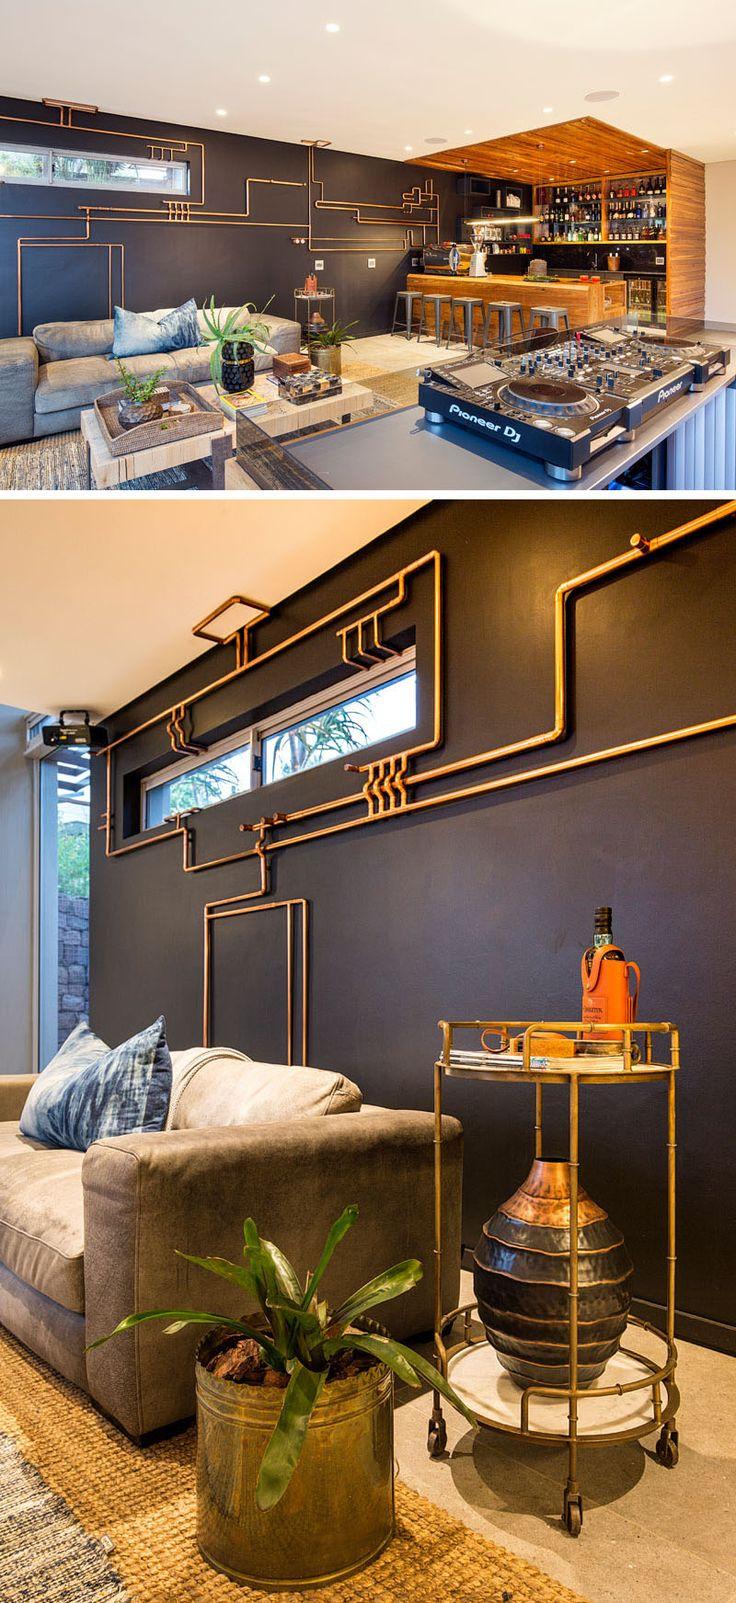 Best 25+ Black accent walls ideas on Pinterest | Black accents ...